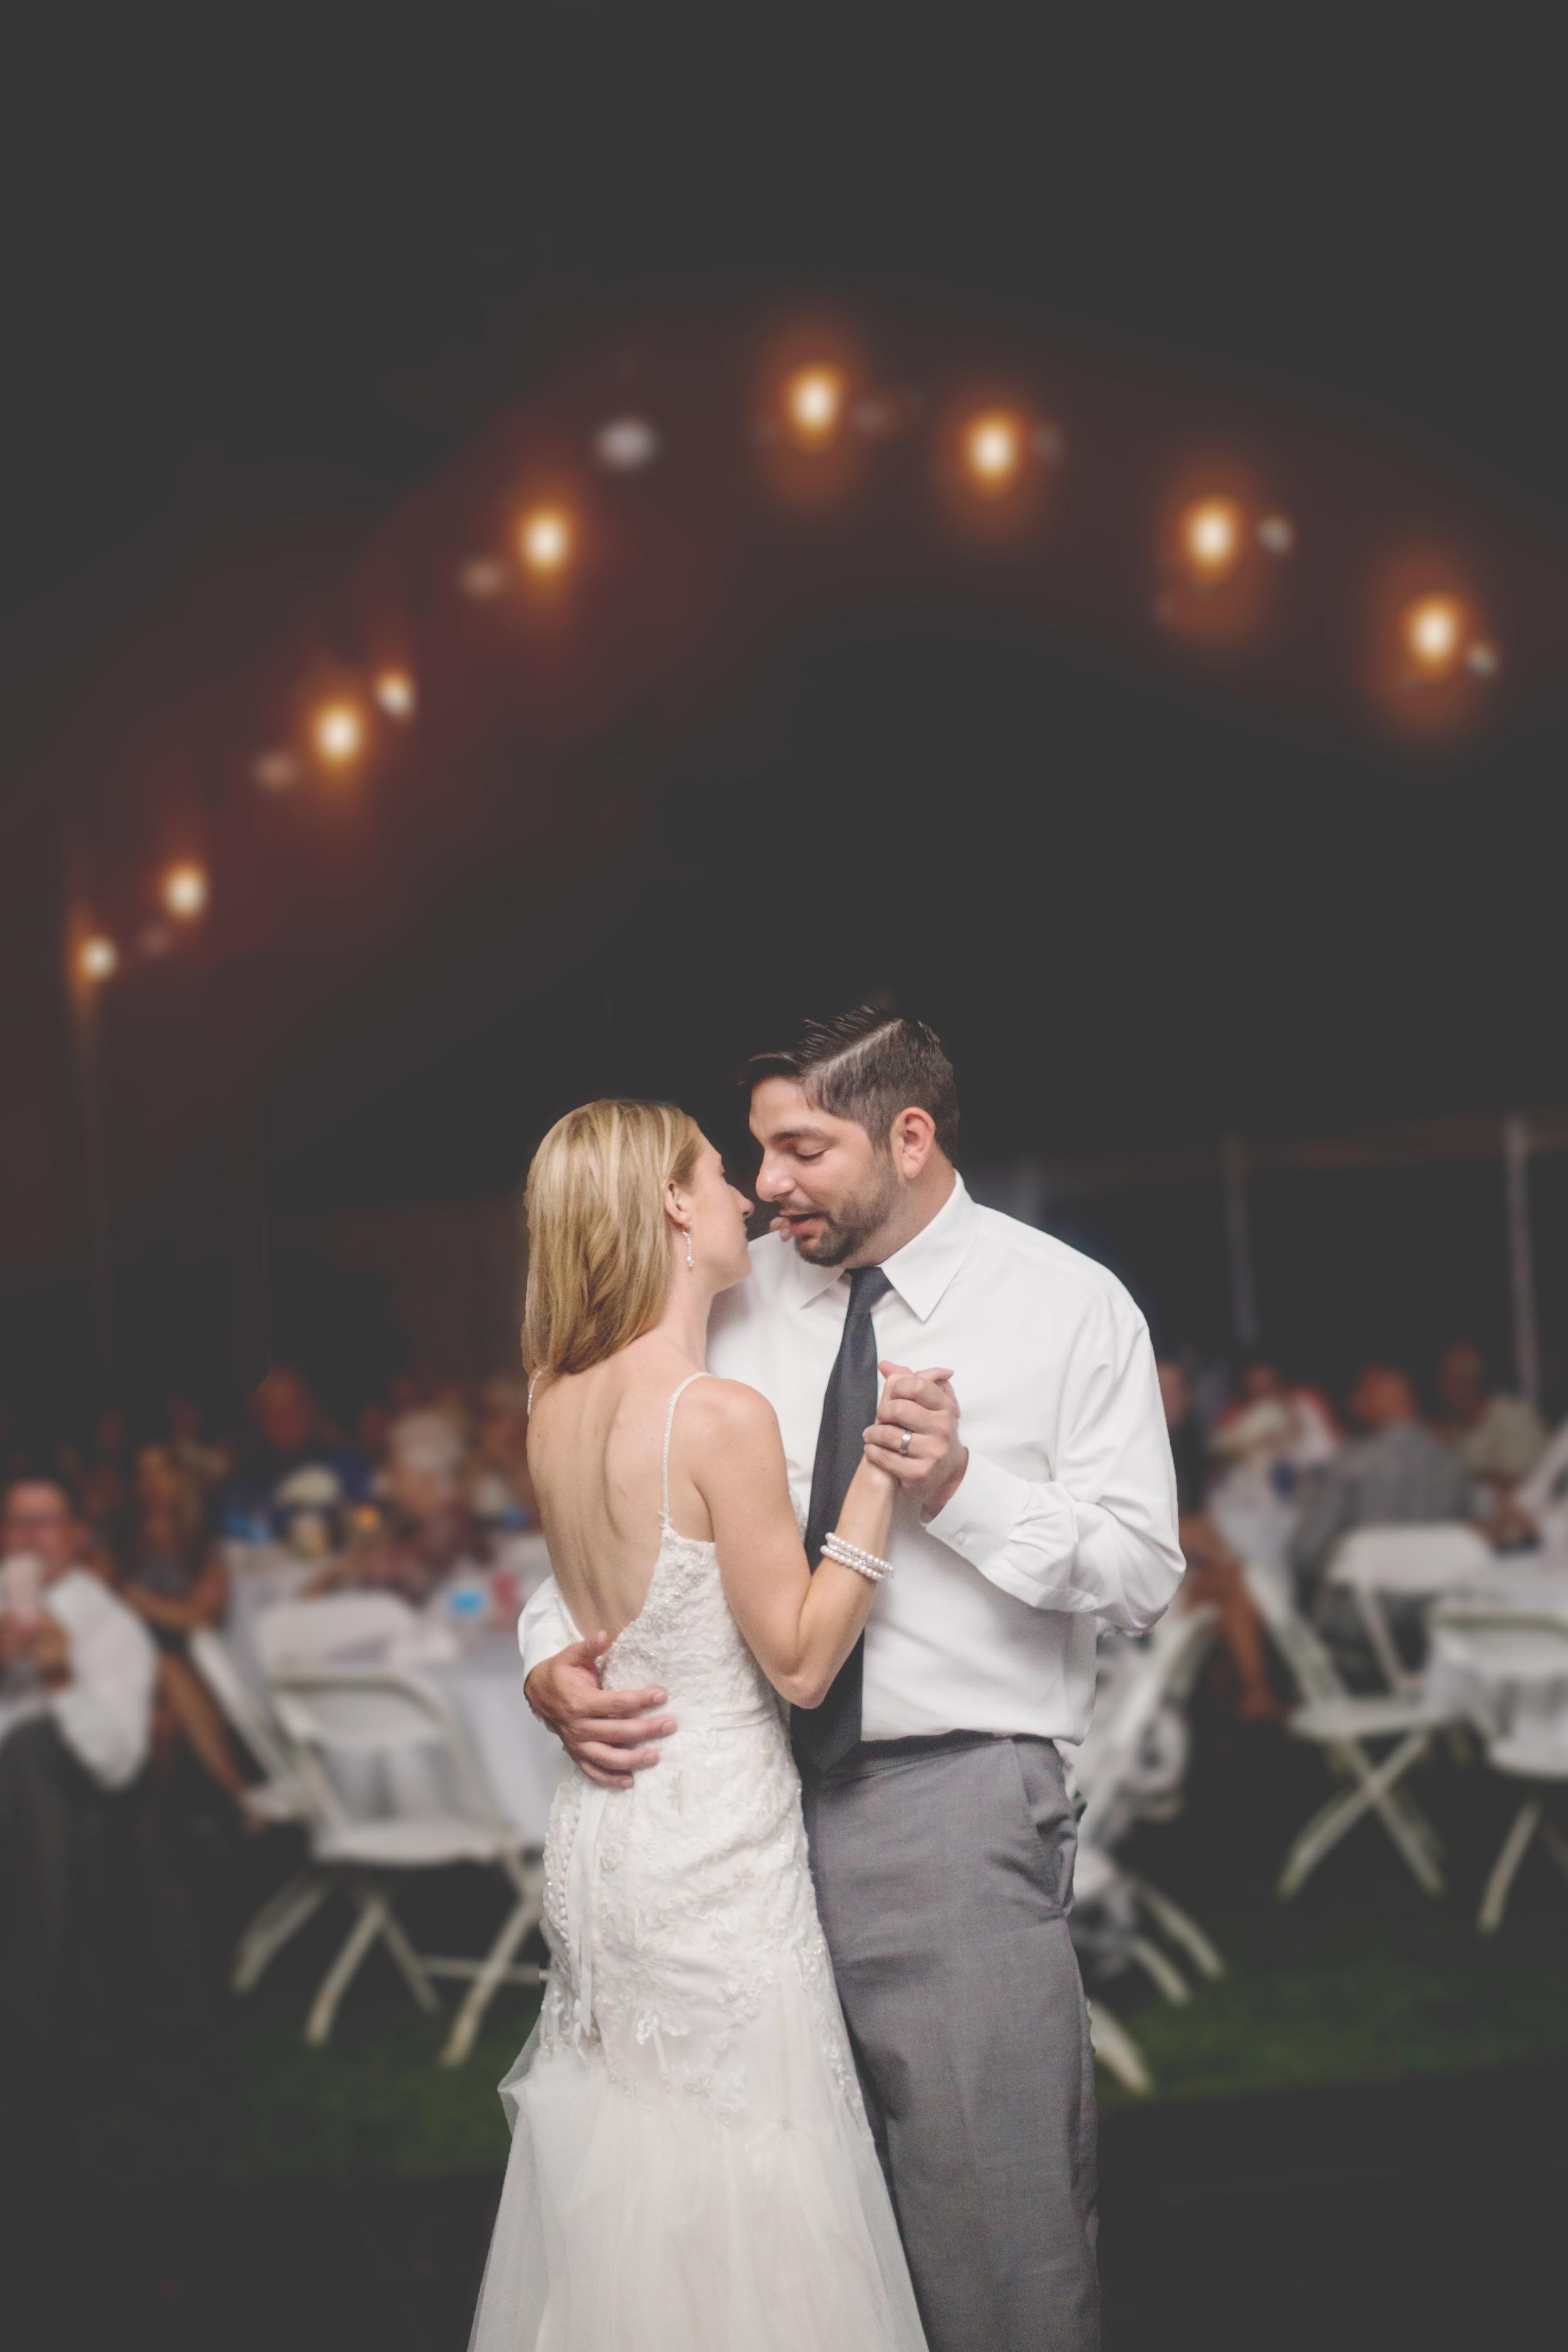 Naperville-wedding-photographer-9-2.jpg